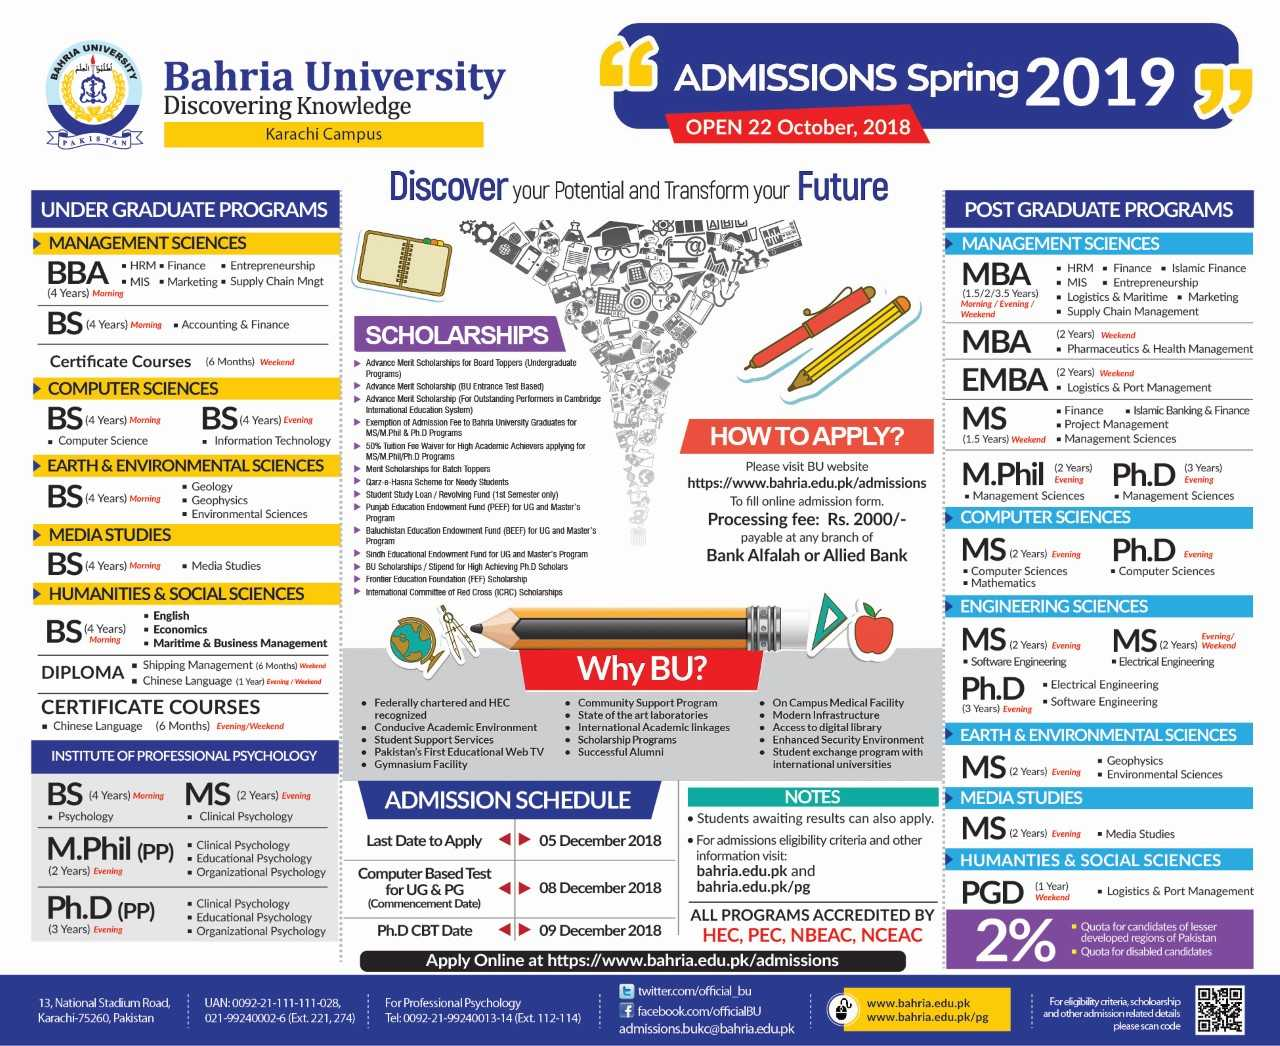 Admissions Open Spring 2019 Bukc Bahria University Karachi Campus